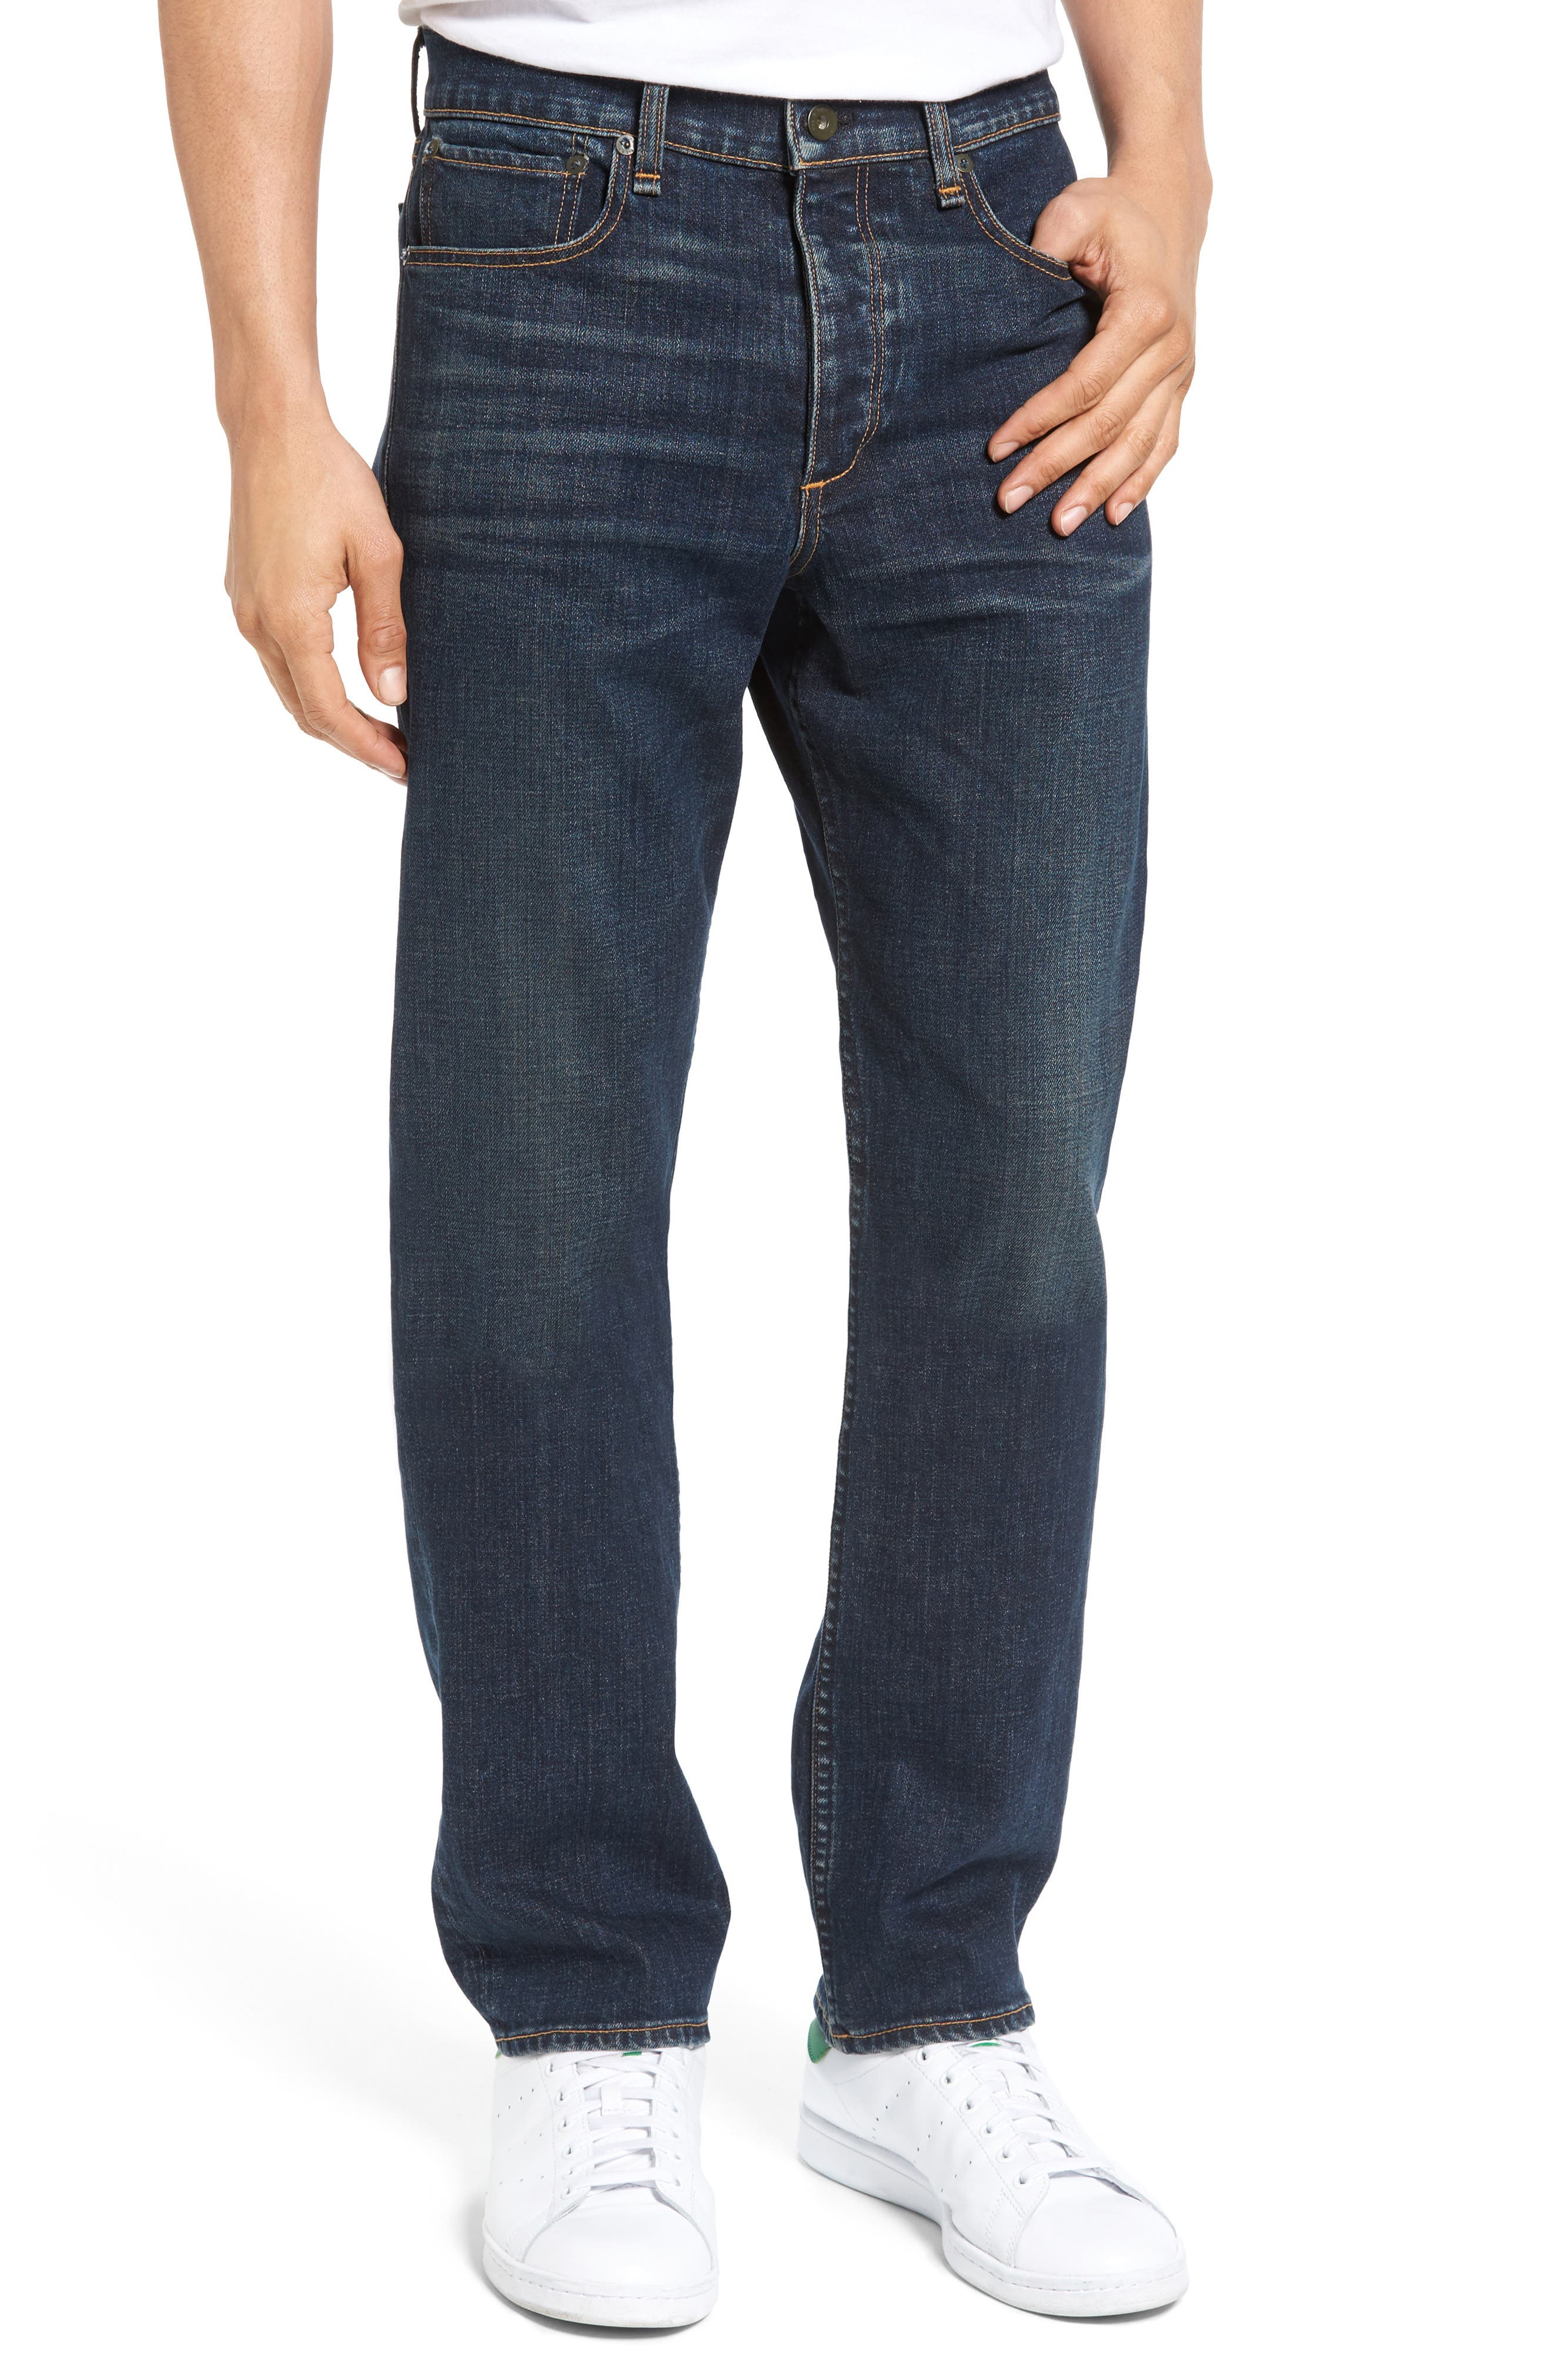 Fit 3 Slim Straight Leg Jeans,                             Main thumbnail 1, color,                             404